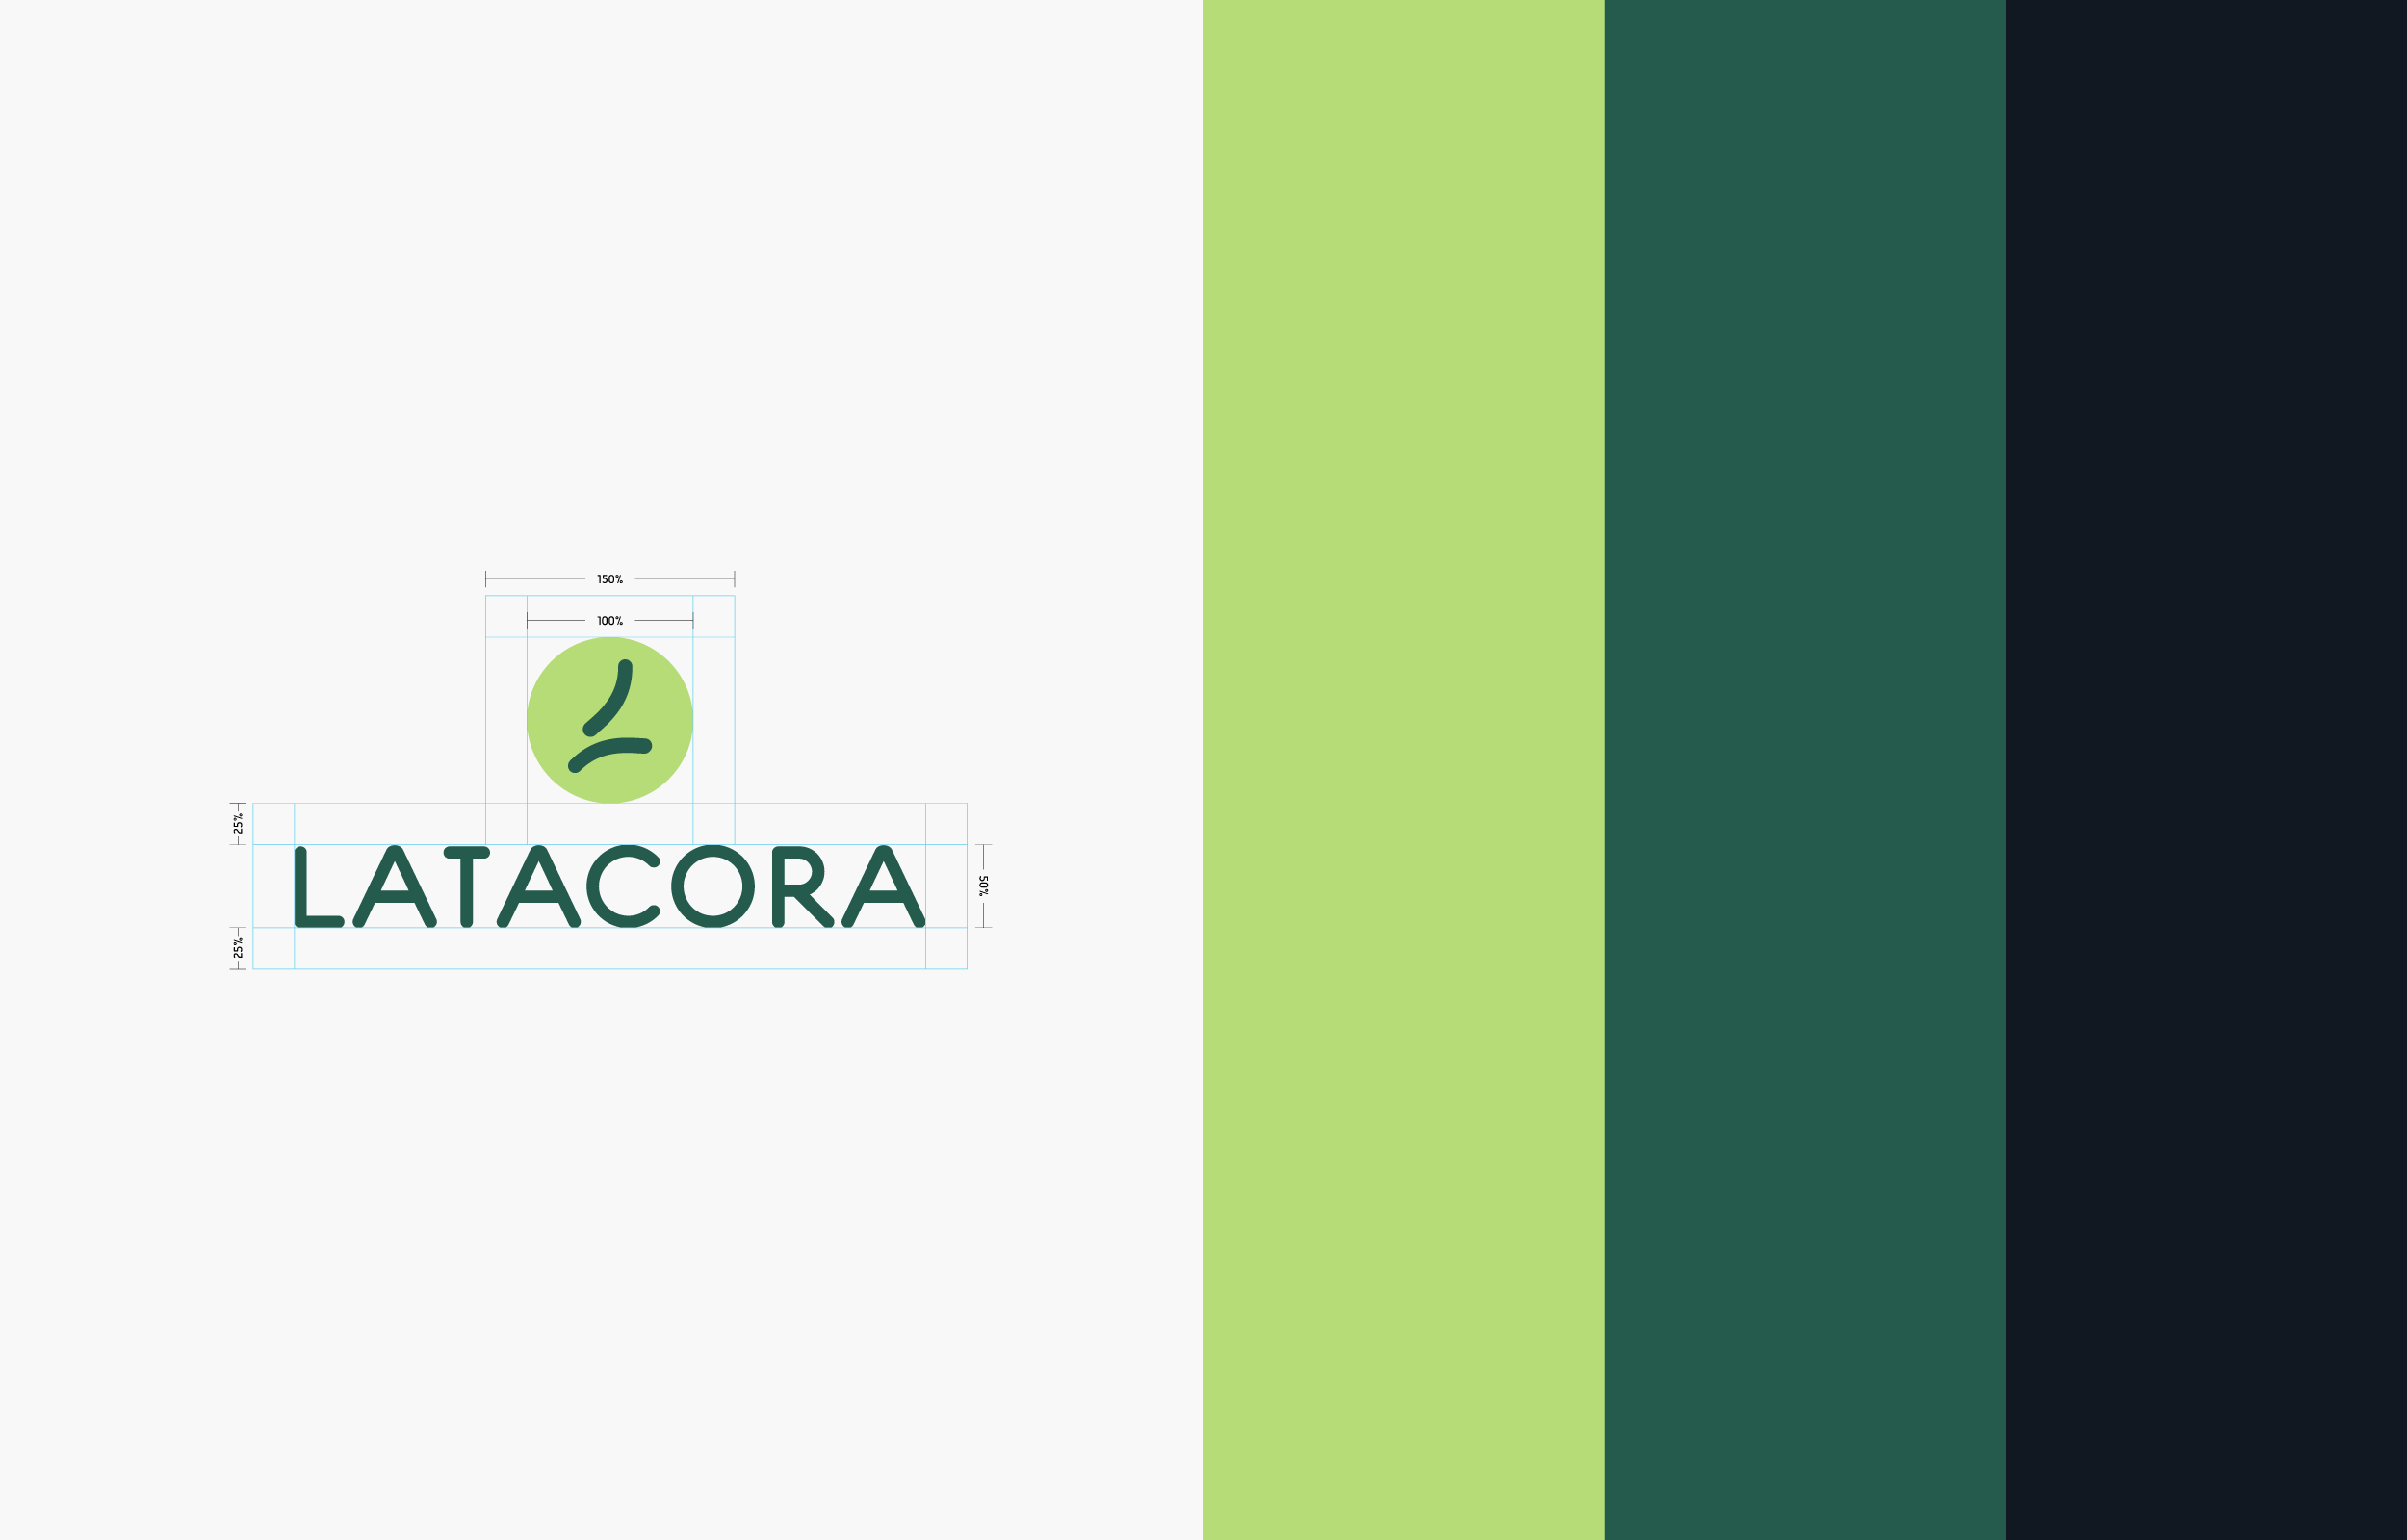 latacora_logo_colors.png